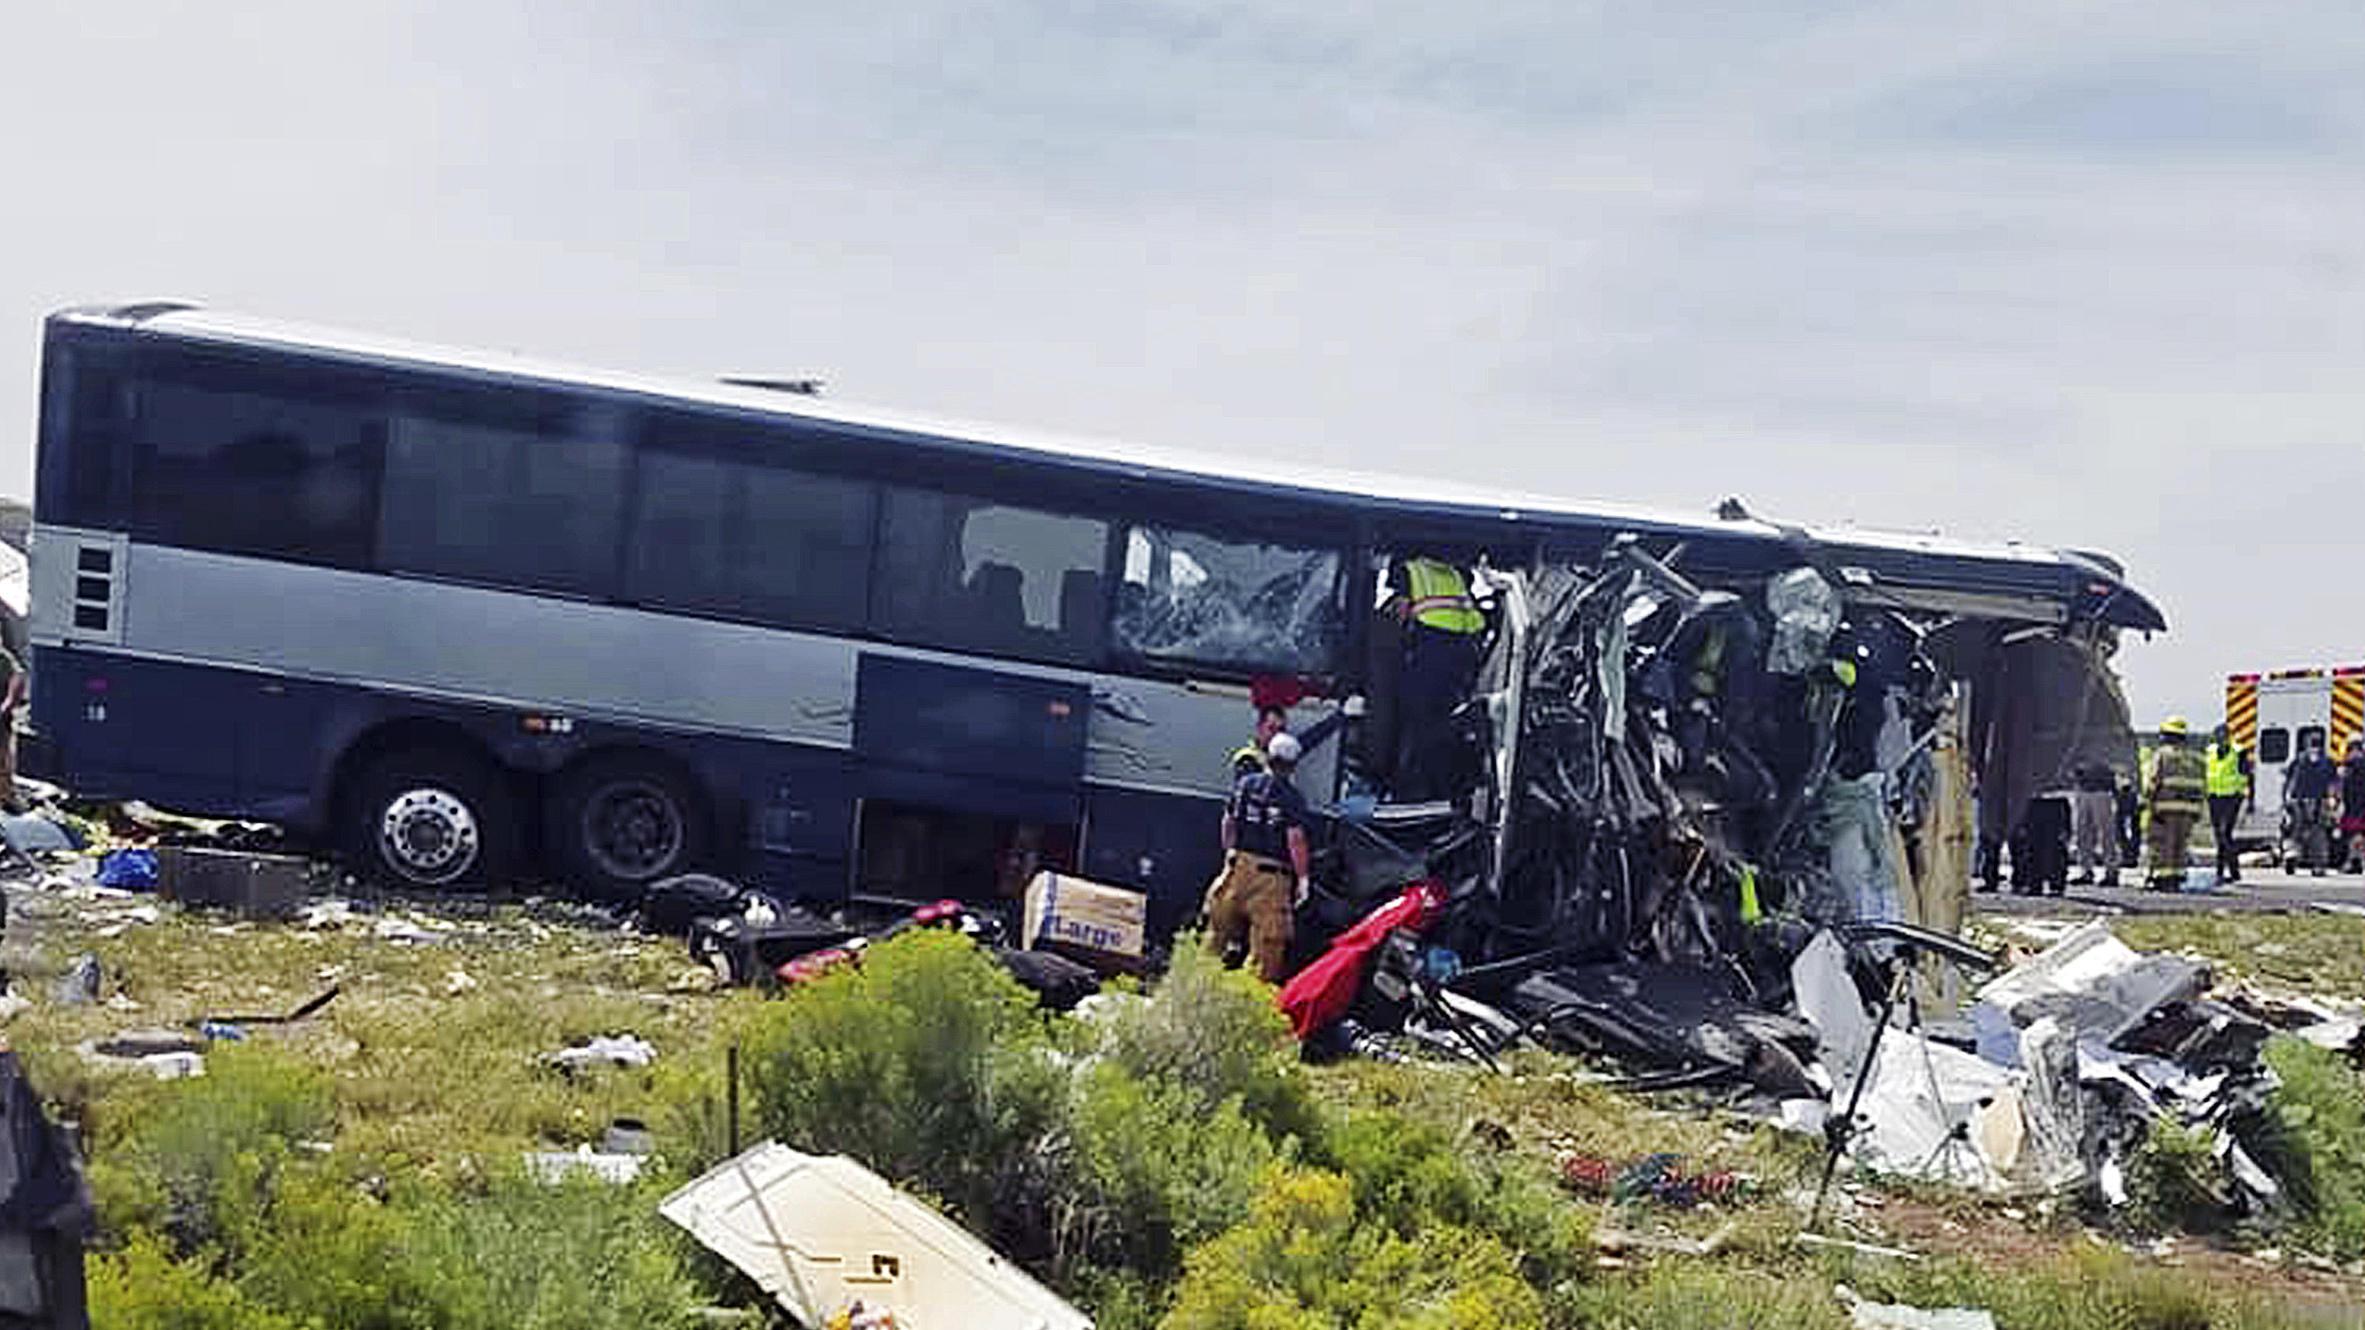 At least 7 die as Greyhound bus, semitrailer collide head-on